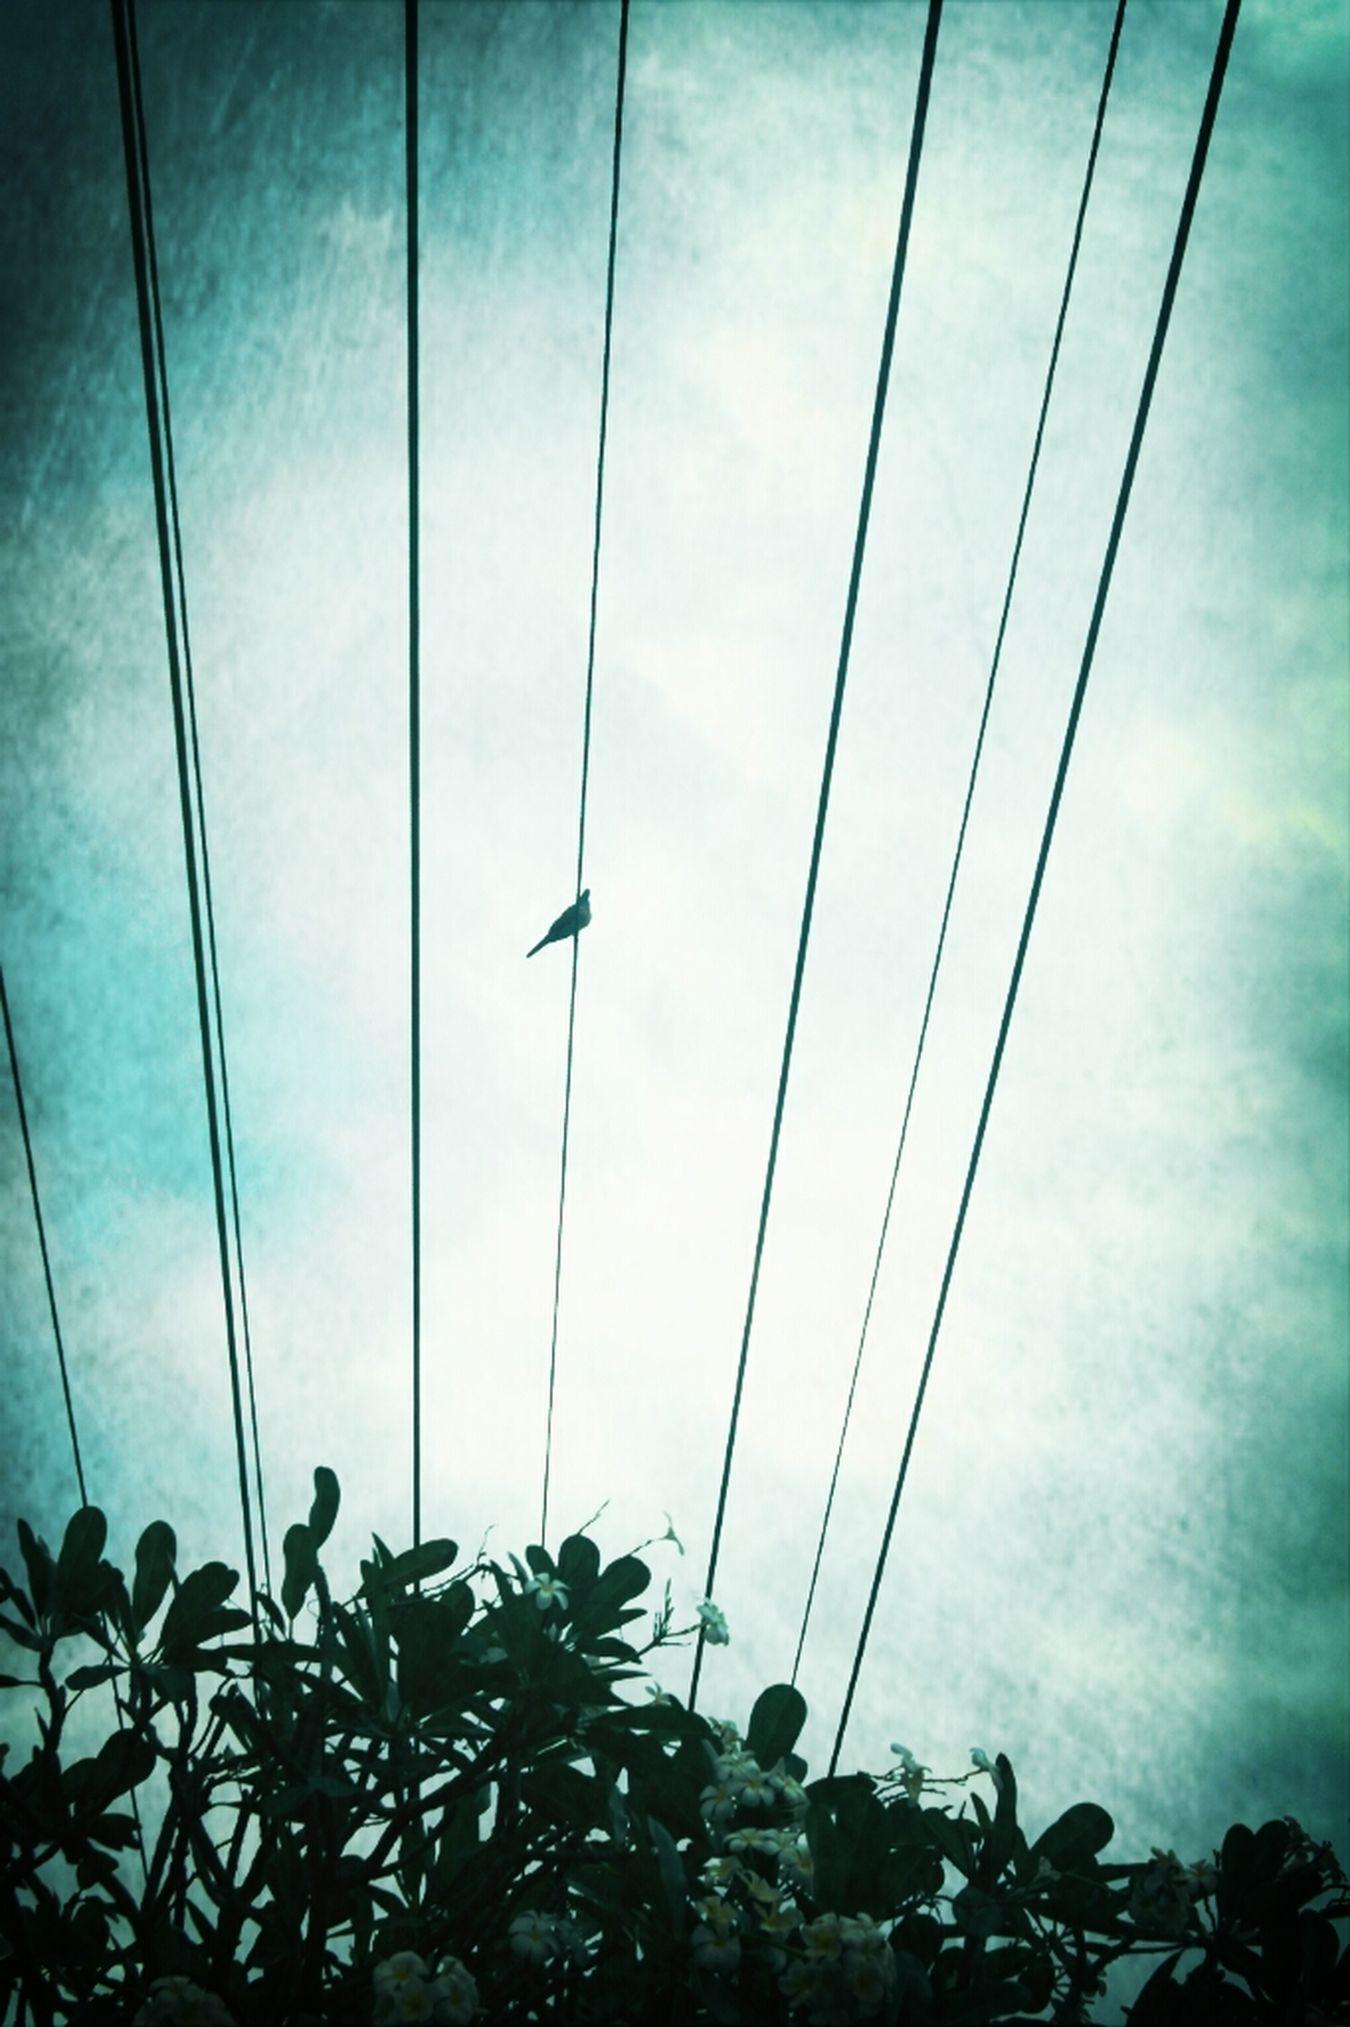 Vintage Bird On A Wire Powerlines Frangipanni